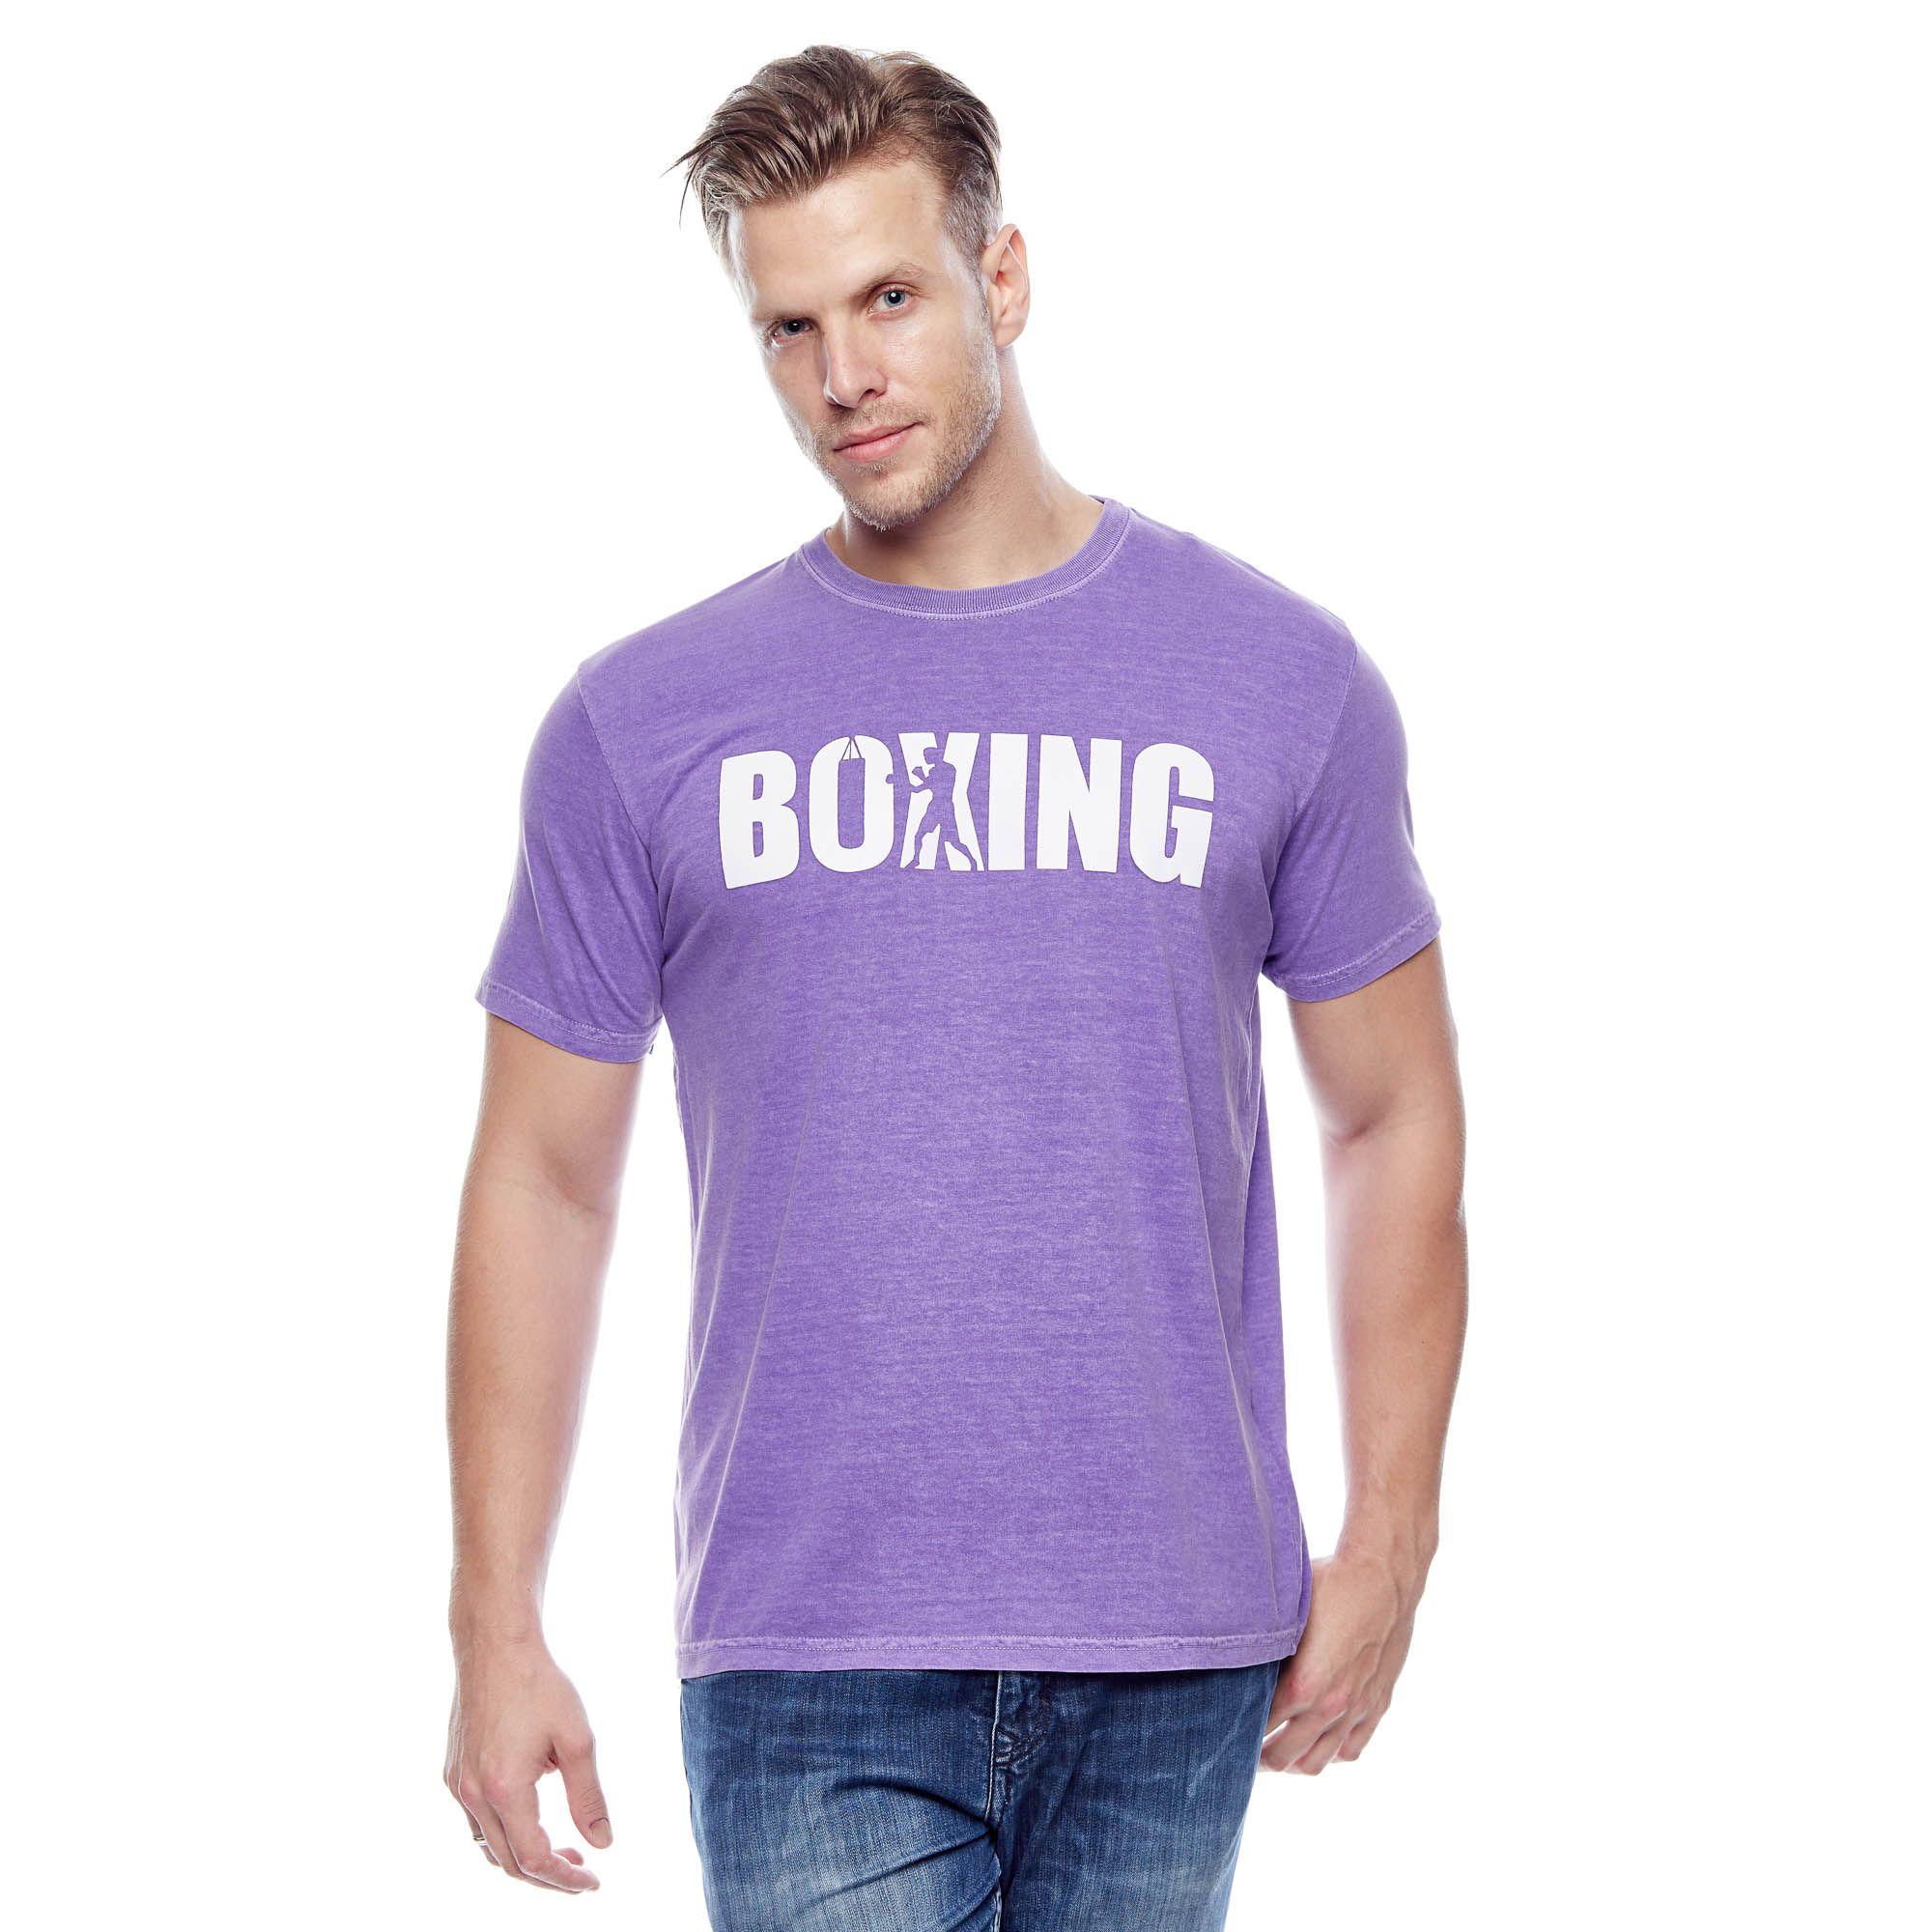 Camiseta Evolvee Boxing P4P Masculina